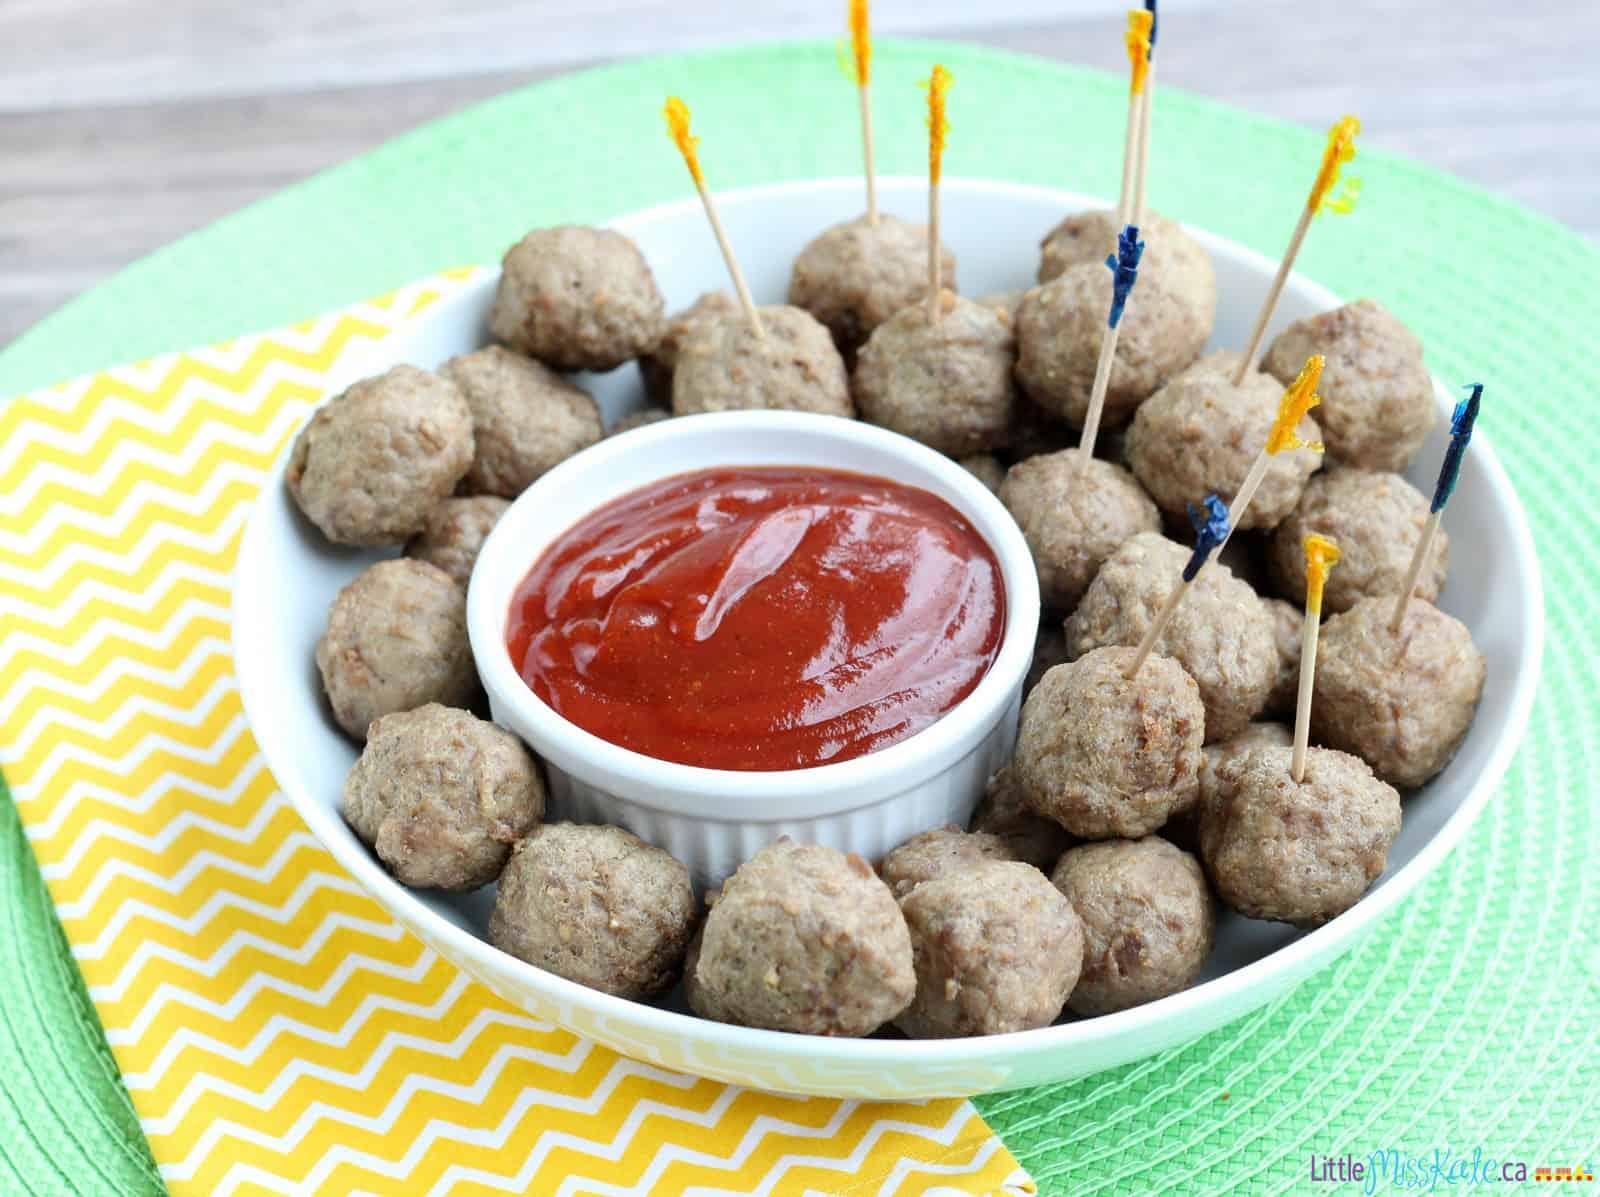 Quebec Inspired Dip with Cocktail Meatballs Recipe via LittleMissKate.ca